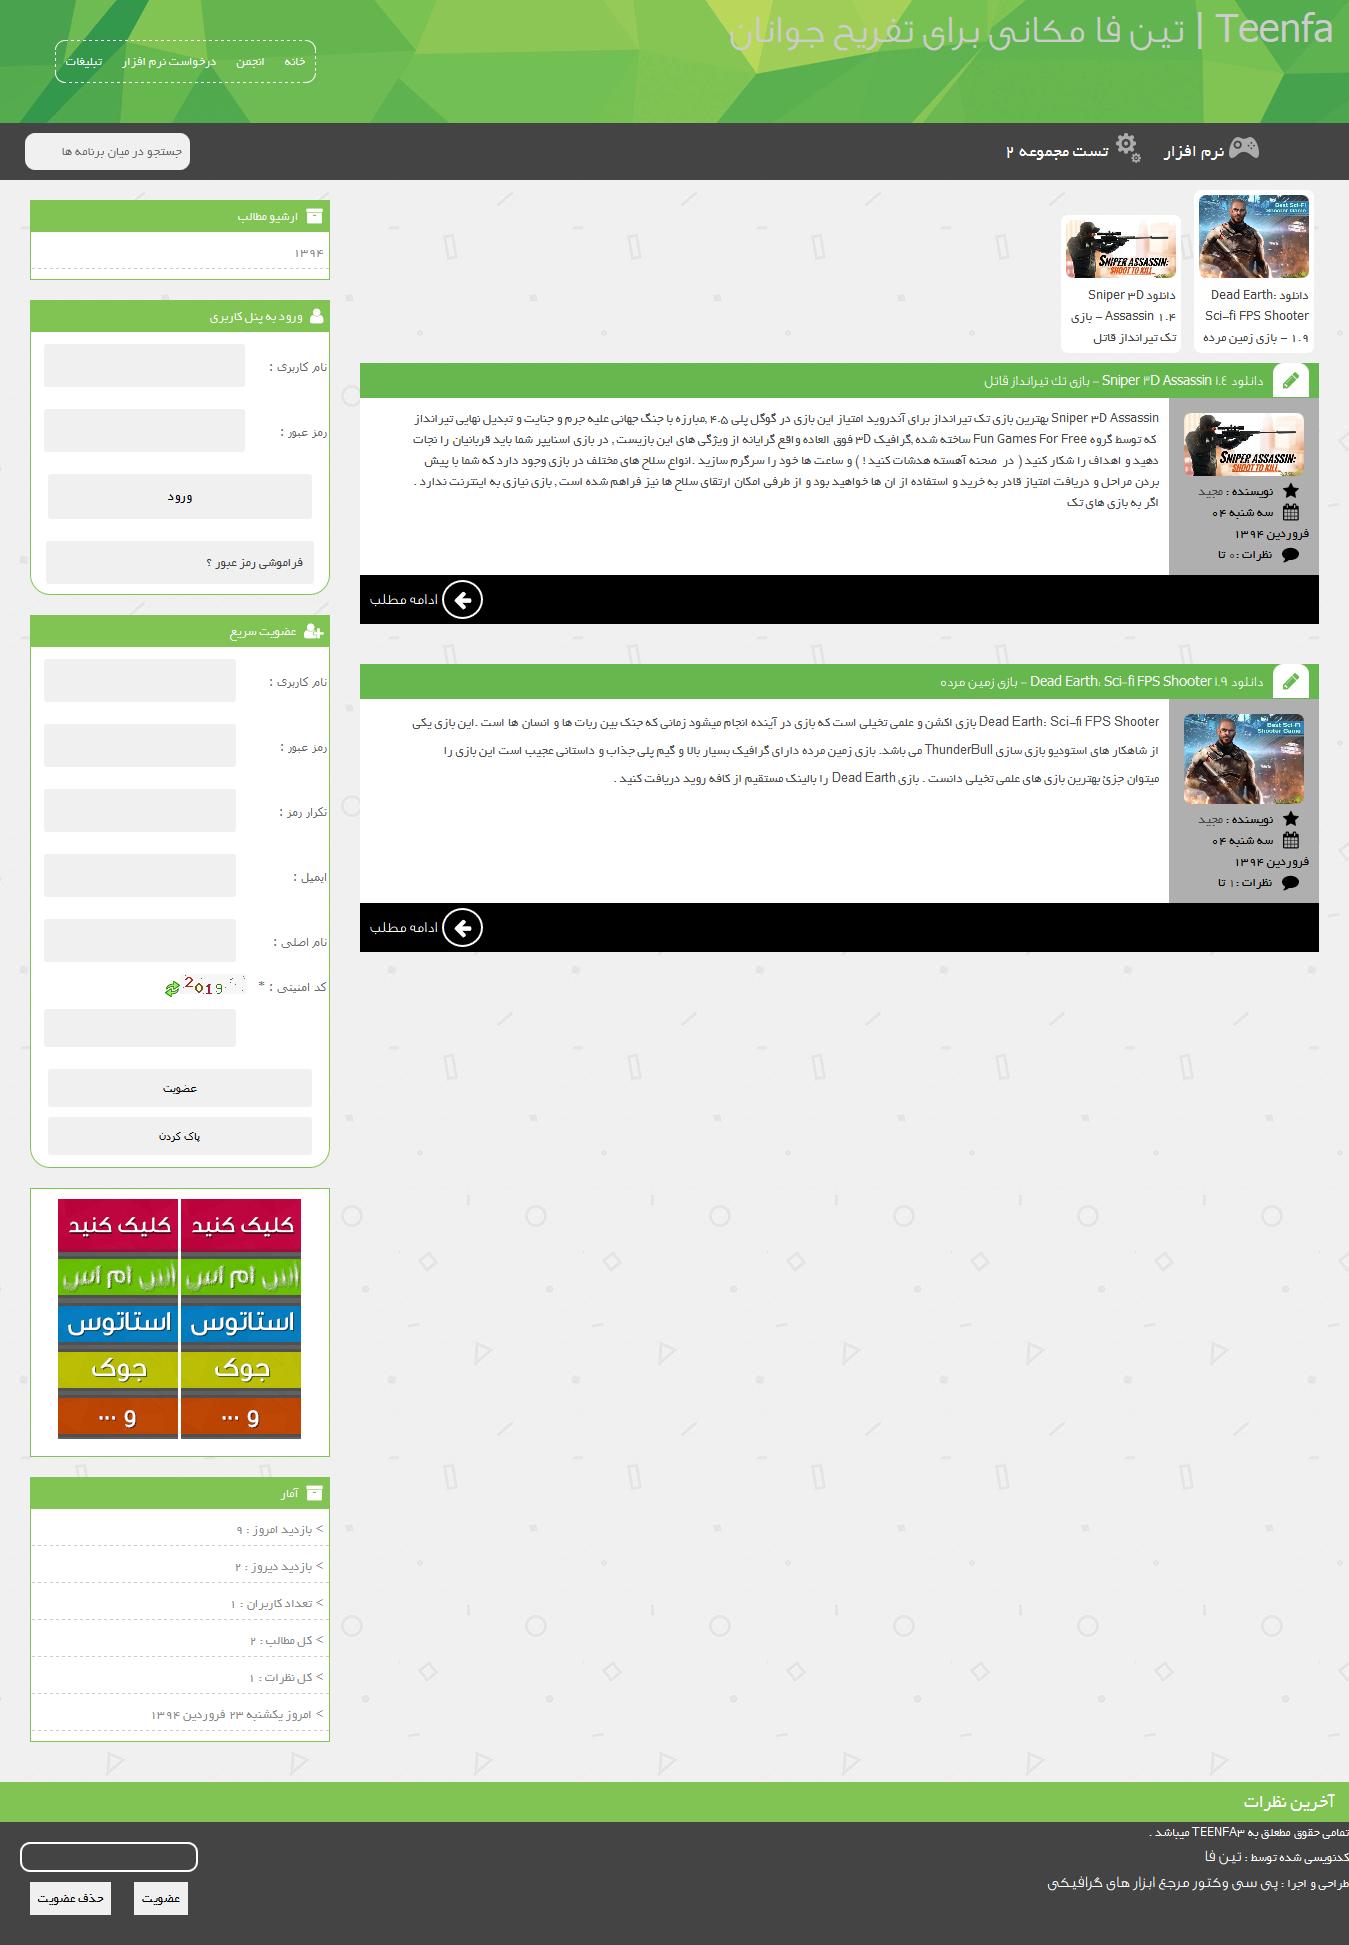 ghaleb-android-2.pngقالب حرفه ای و زیبا اندروید برای رزبلاگ. + دانلود با لینک مستقیم | پیش نمایش ...